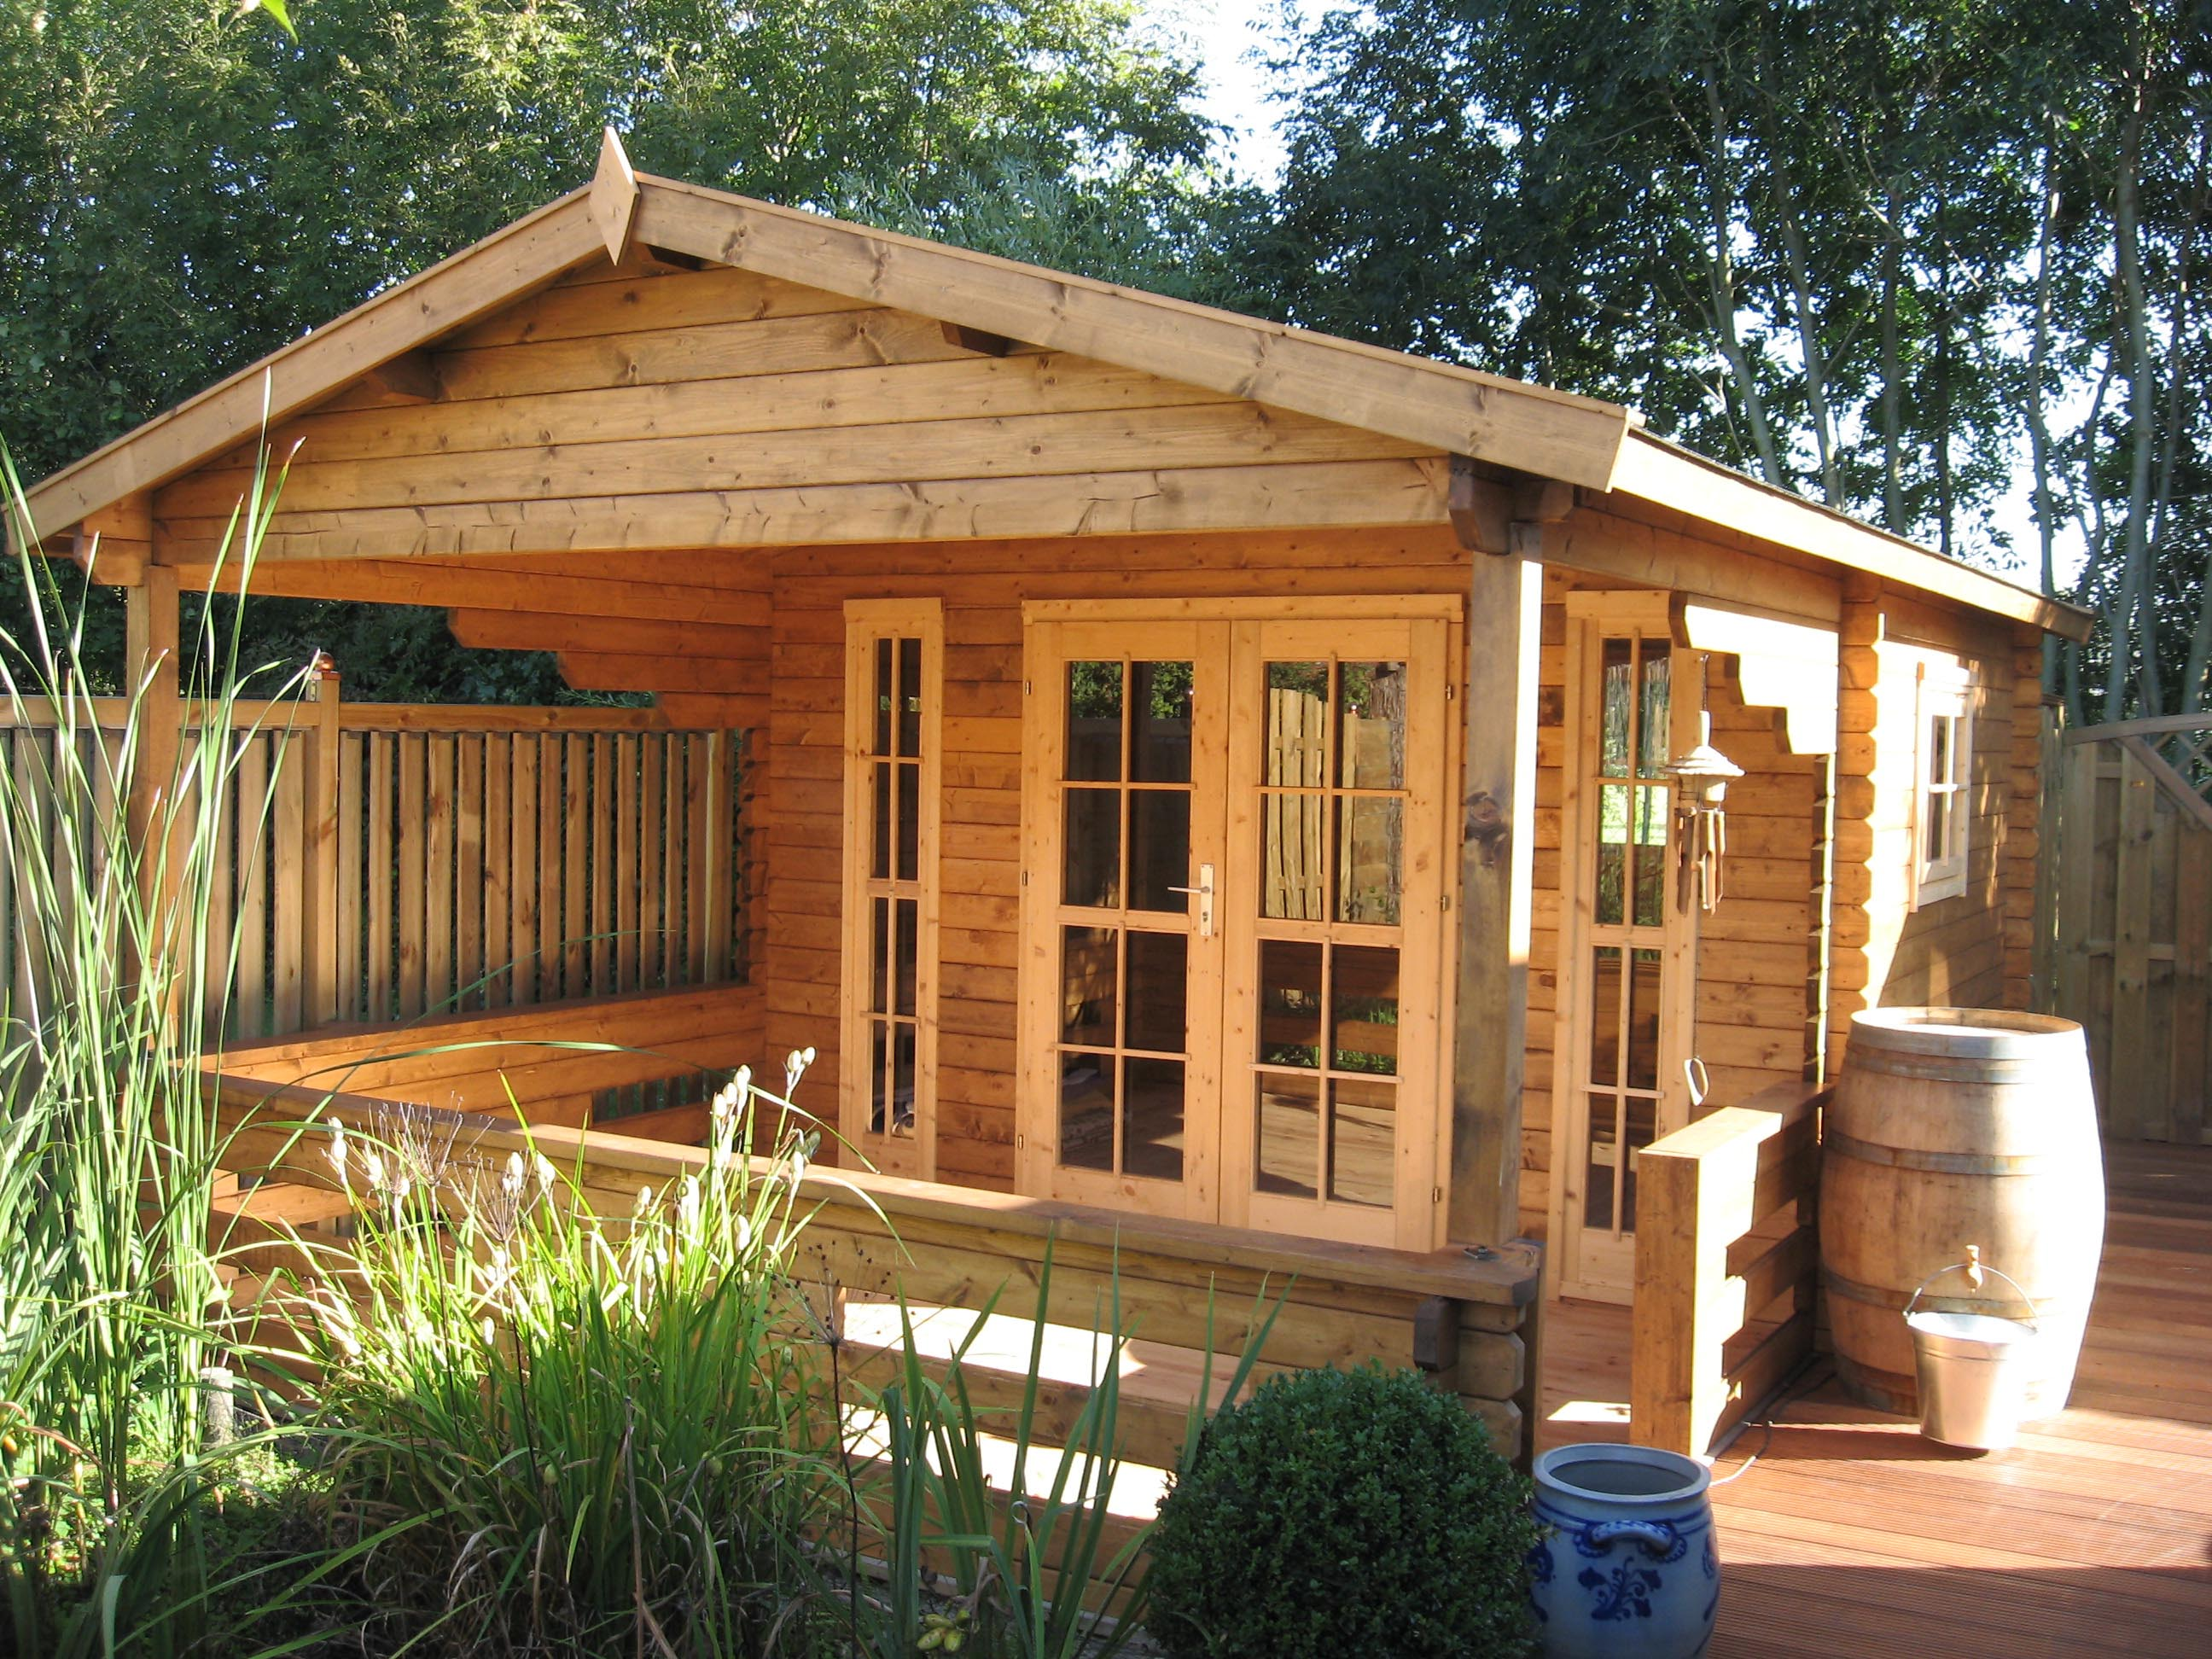 Sanstrov Log Cabin